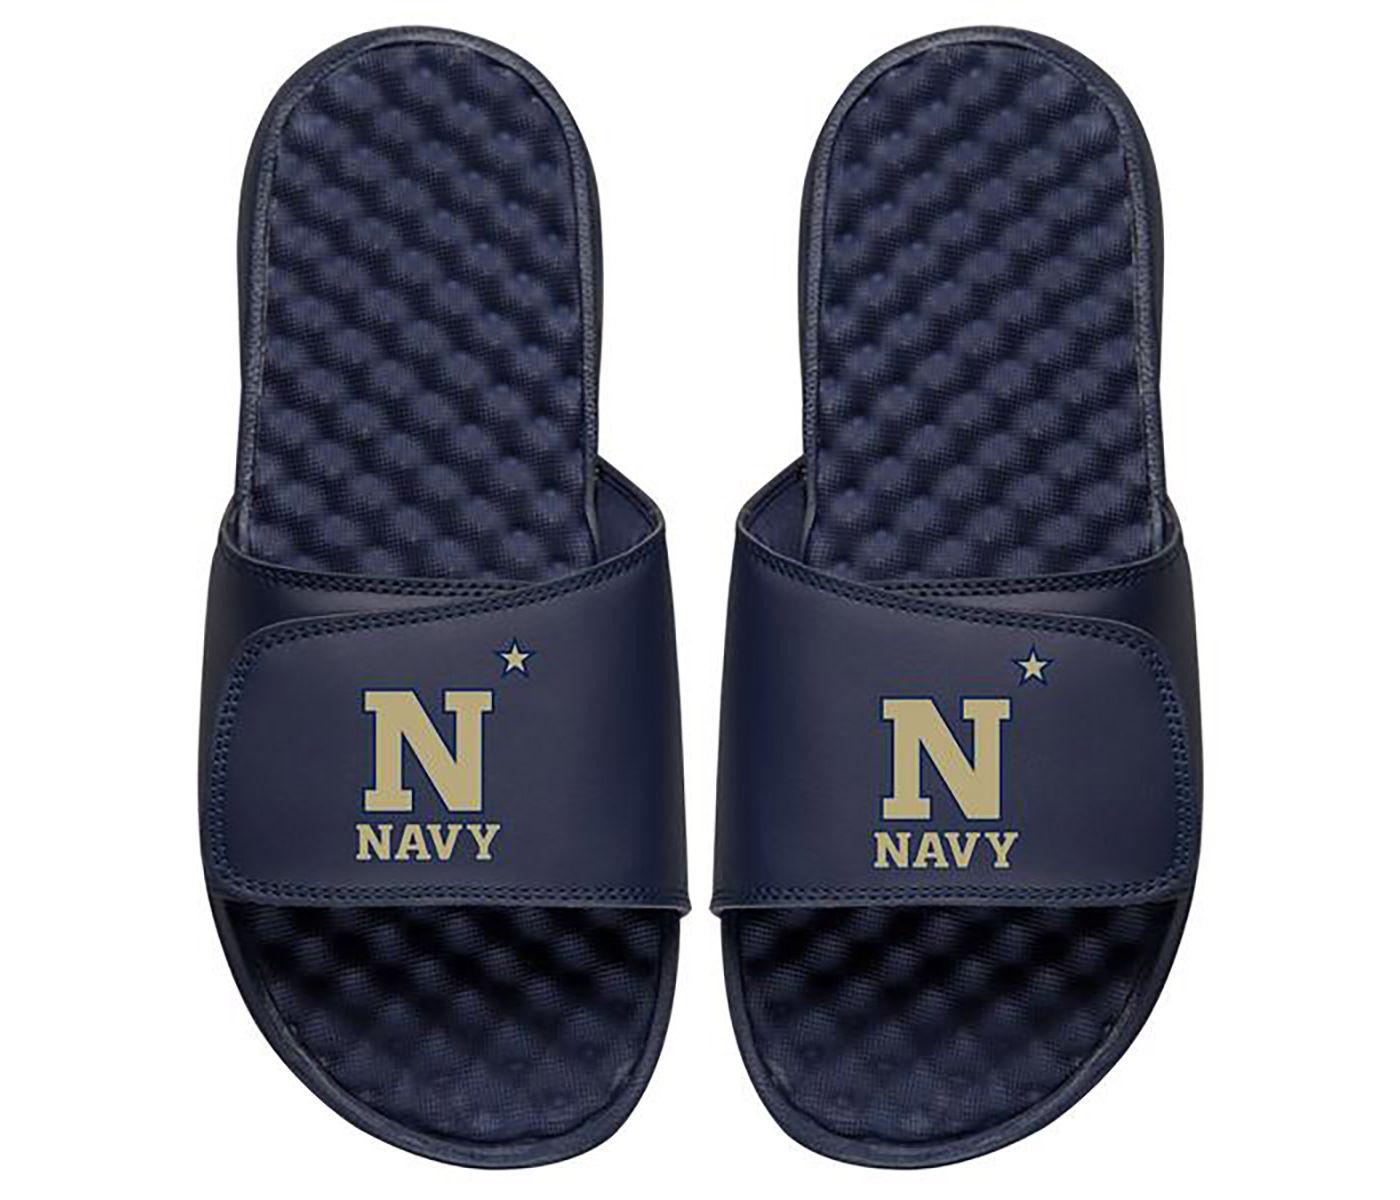 ISlide Navy Midshipmen Sandals